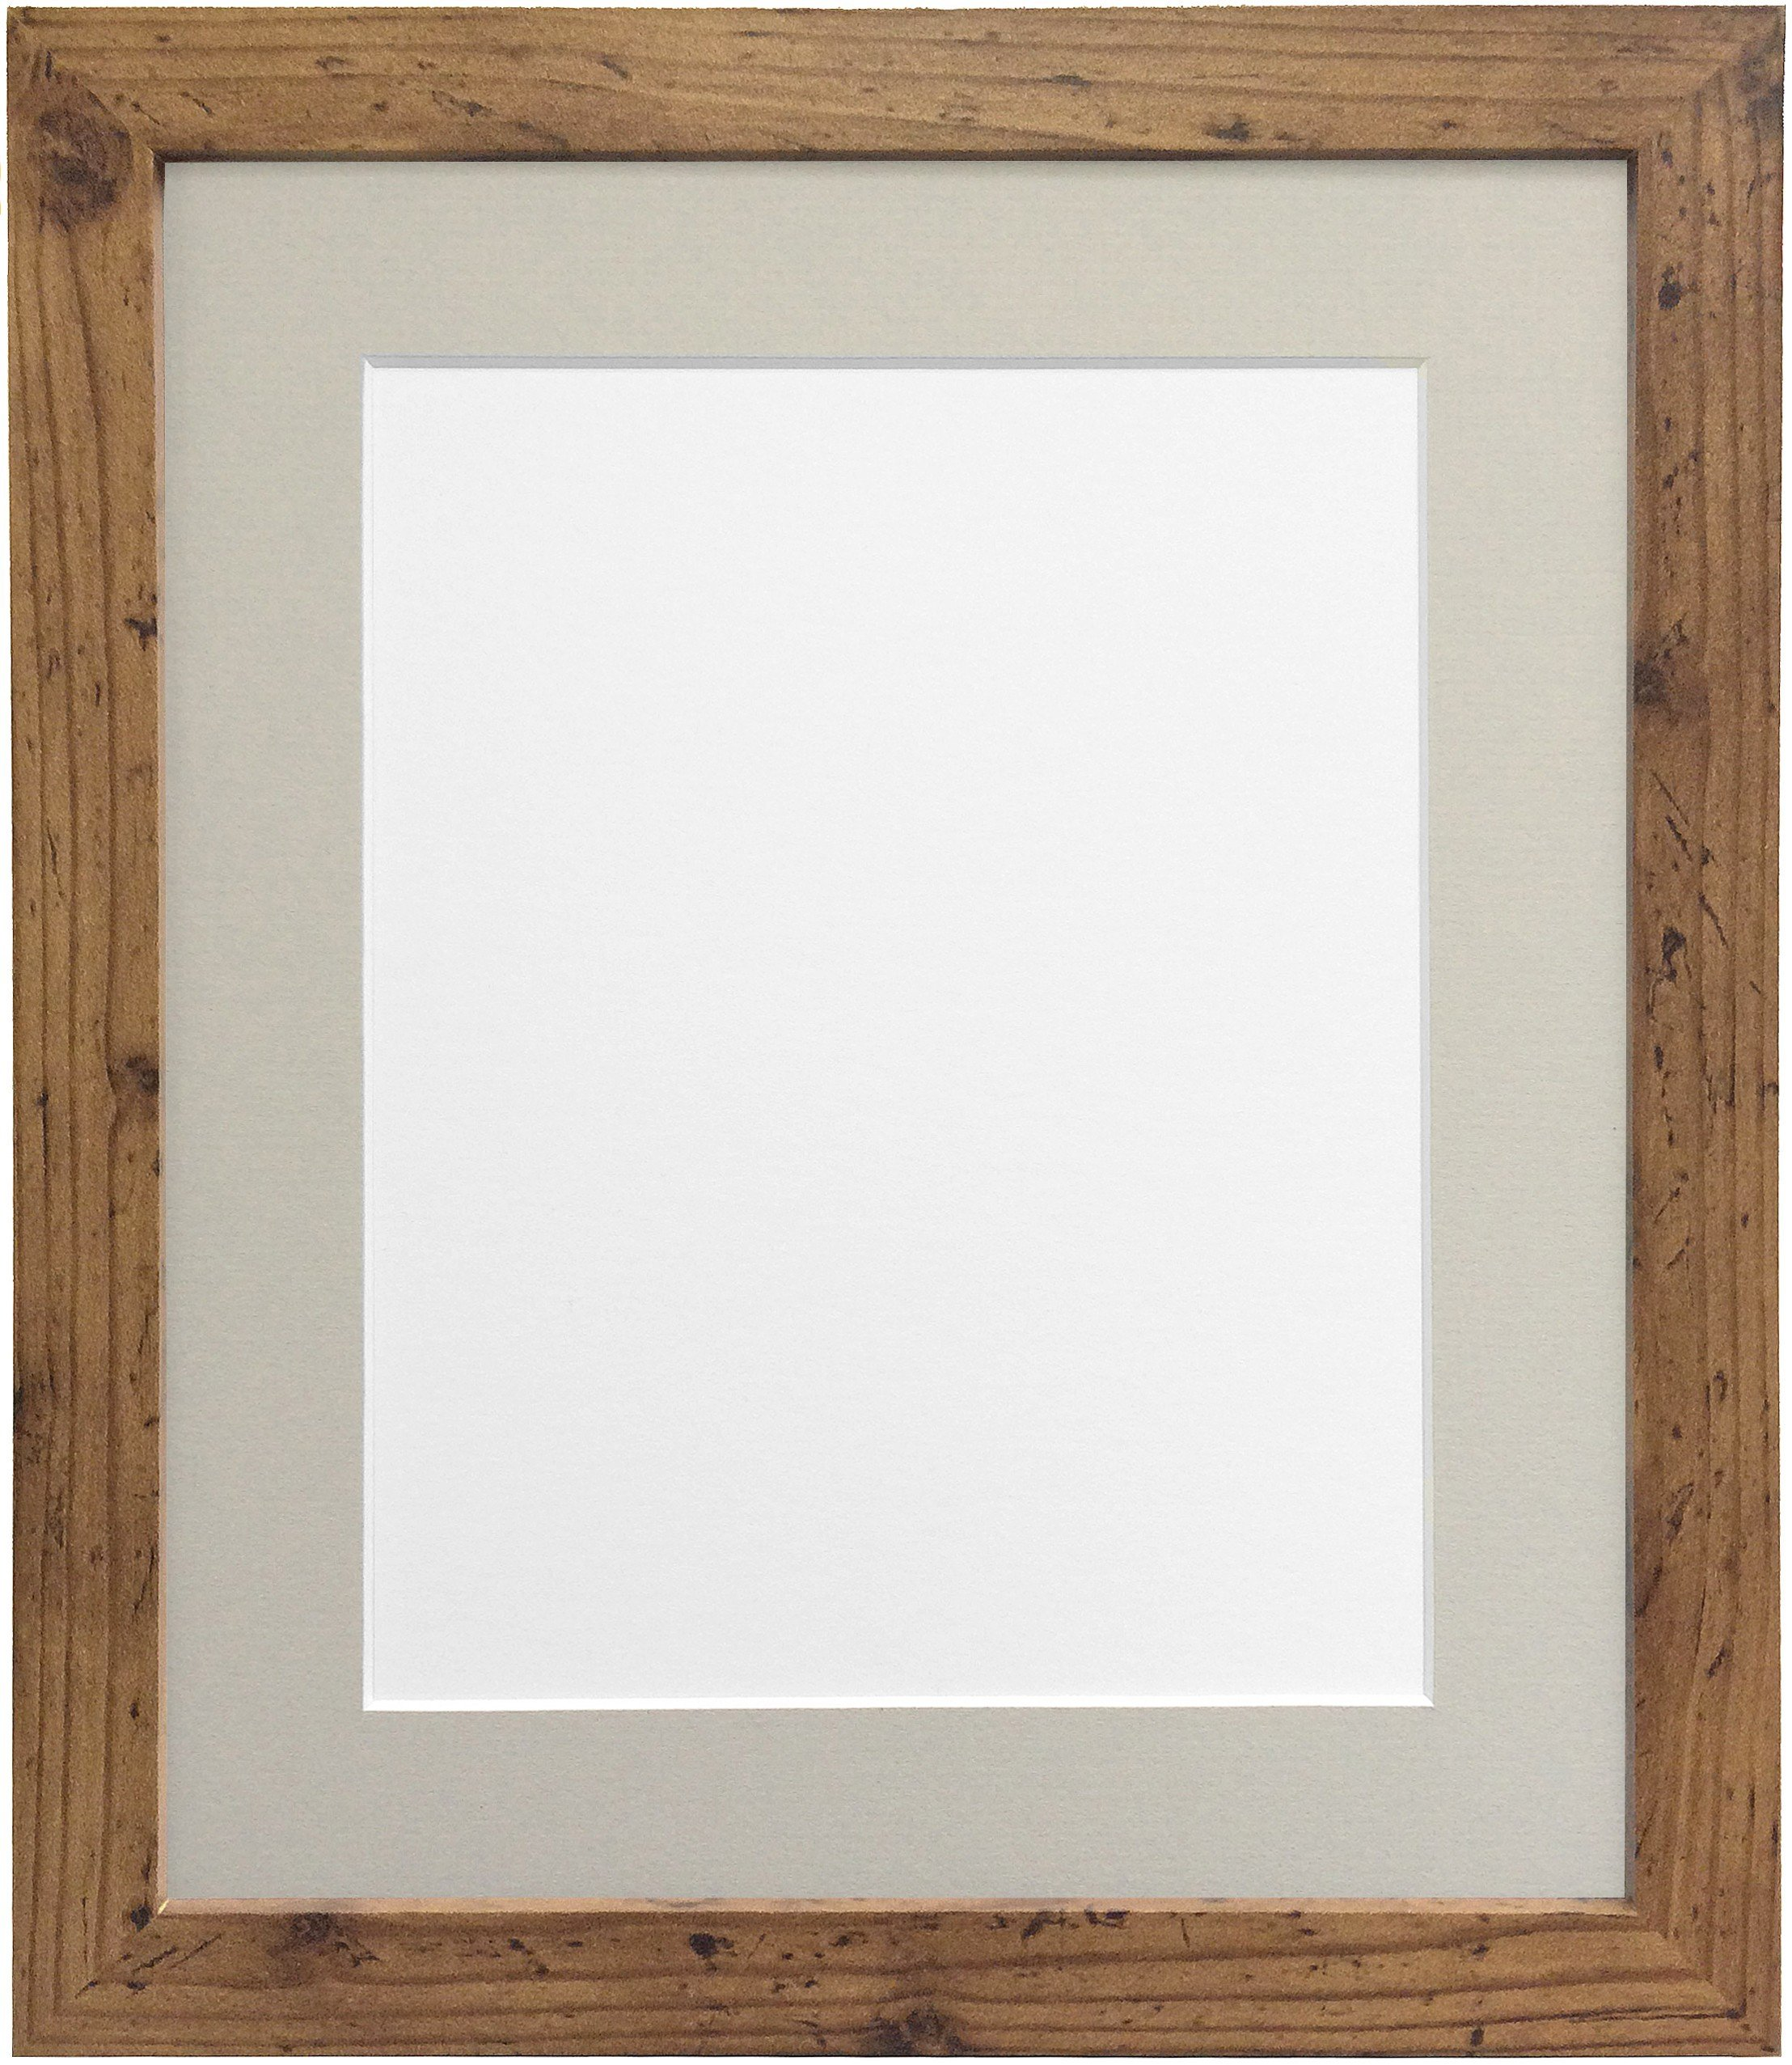 Large Picture Frame: Amazon.co.uk